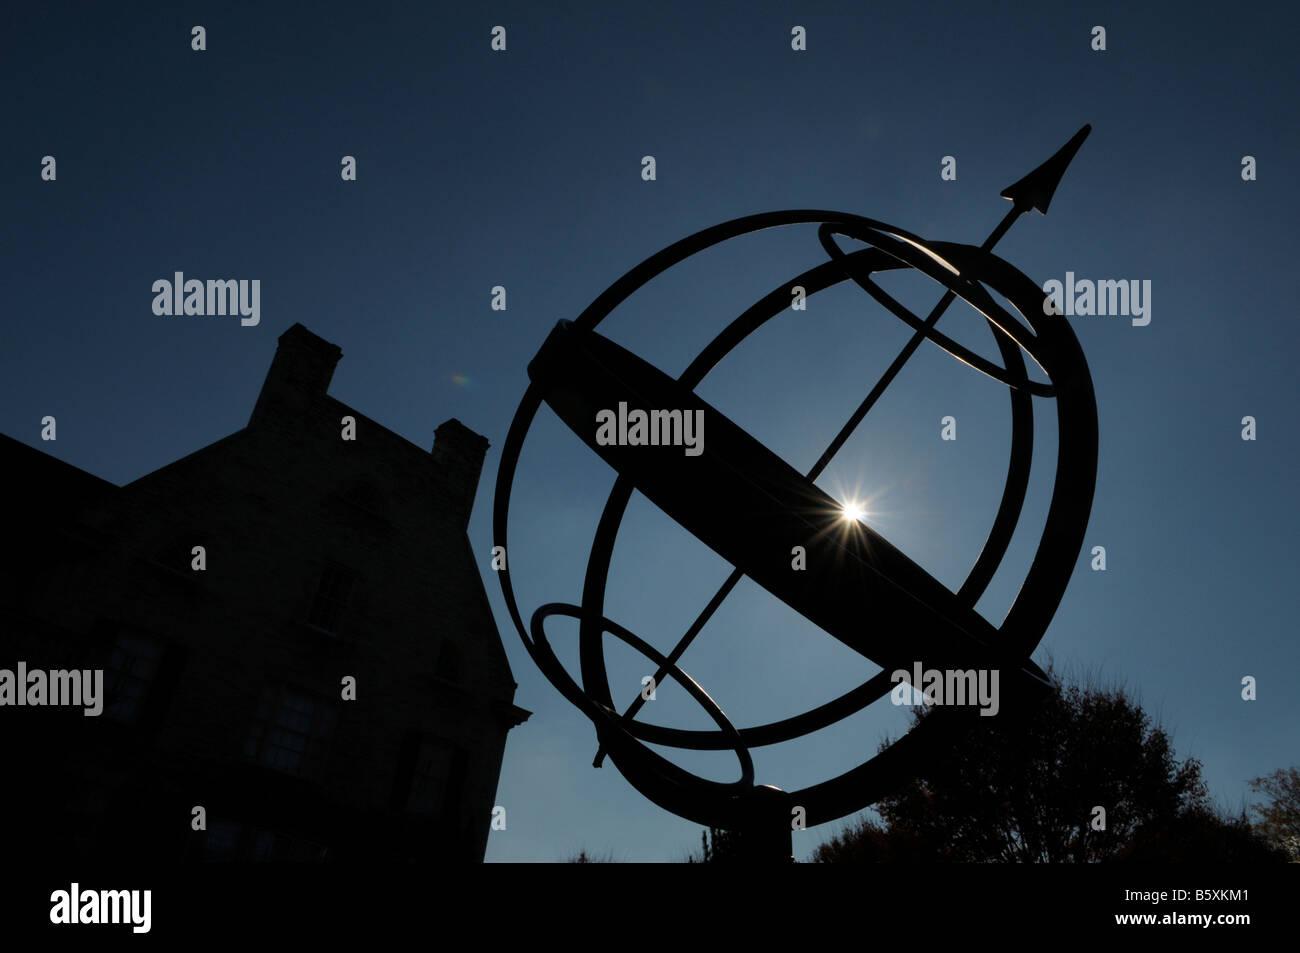 Armillary Spheres Globe. - Stock Image